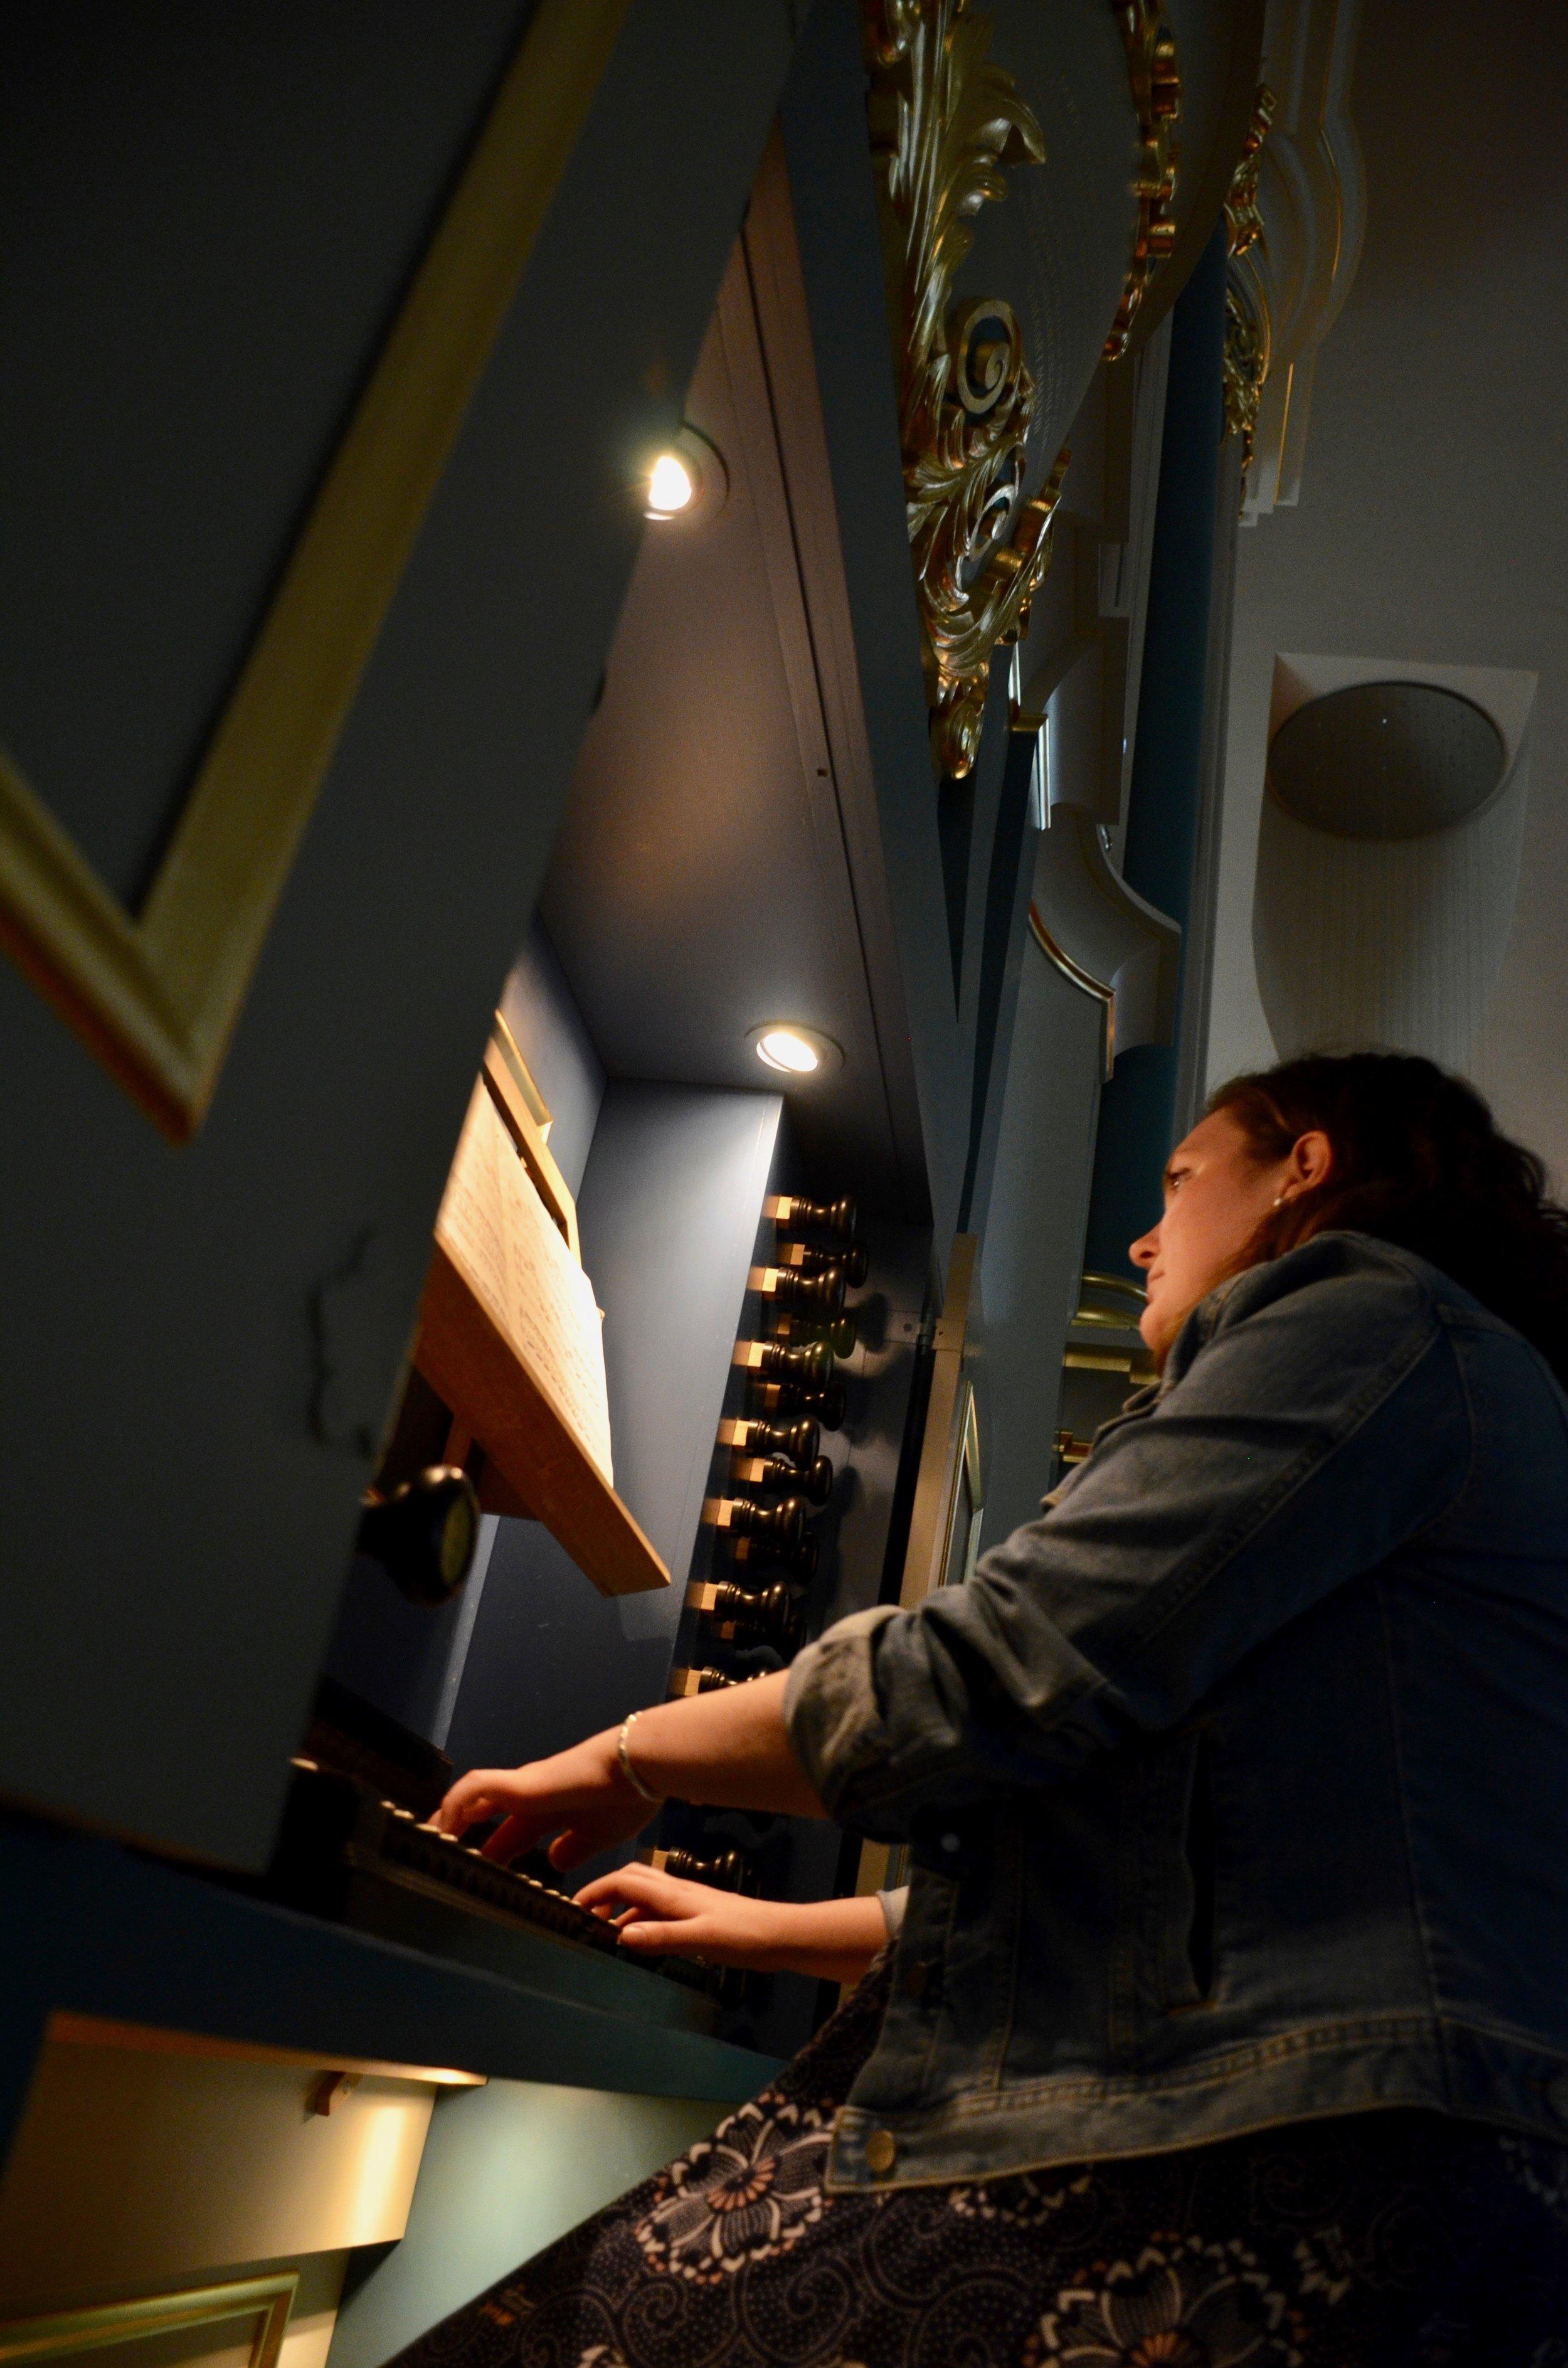 Chelsea Keating plays the Baroque Organ in Orgelpark, Amsterdam.